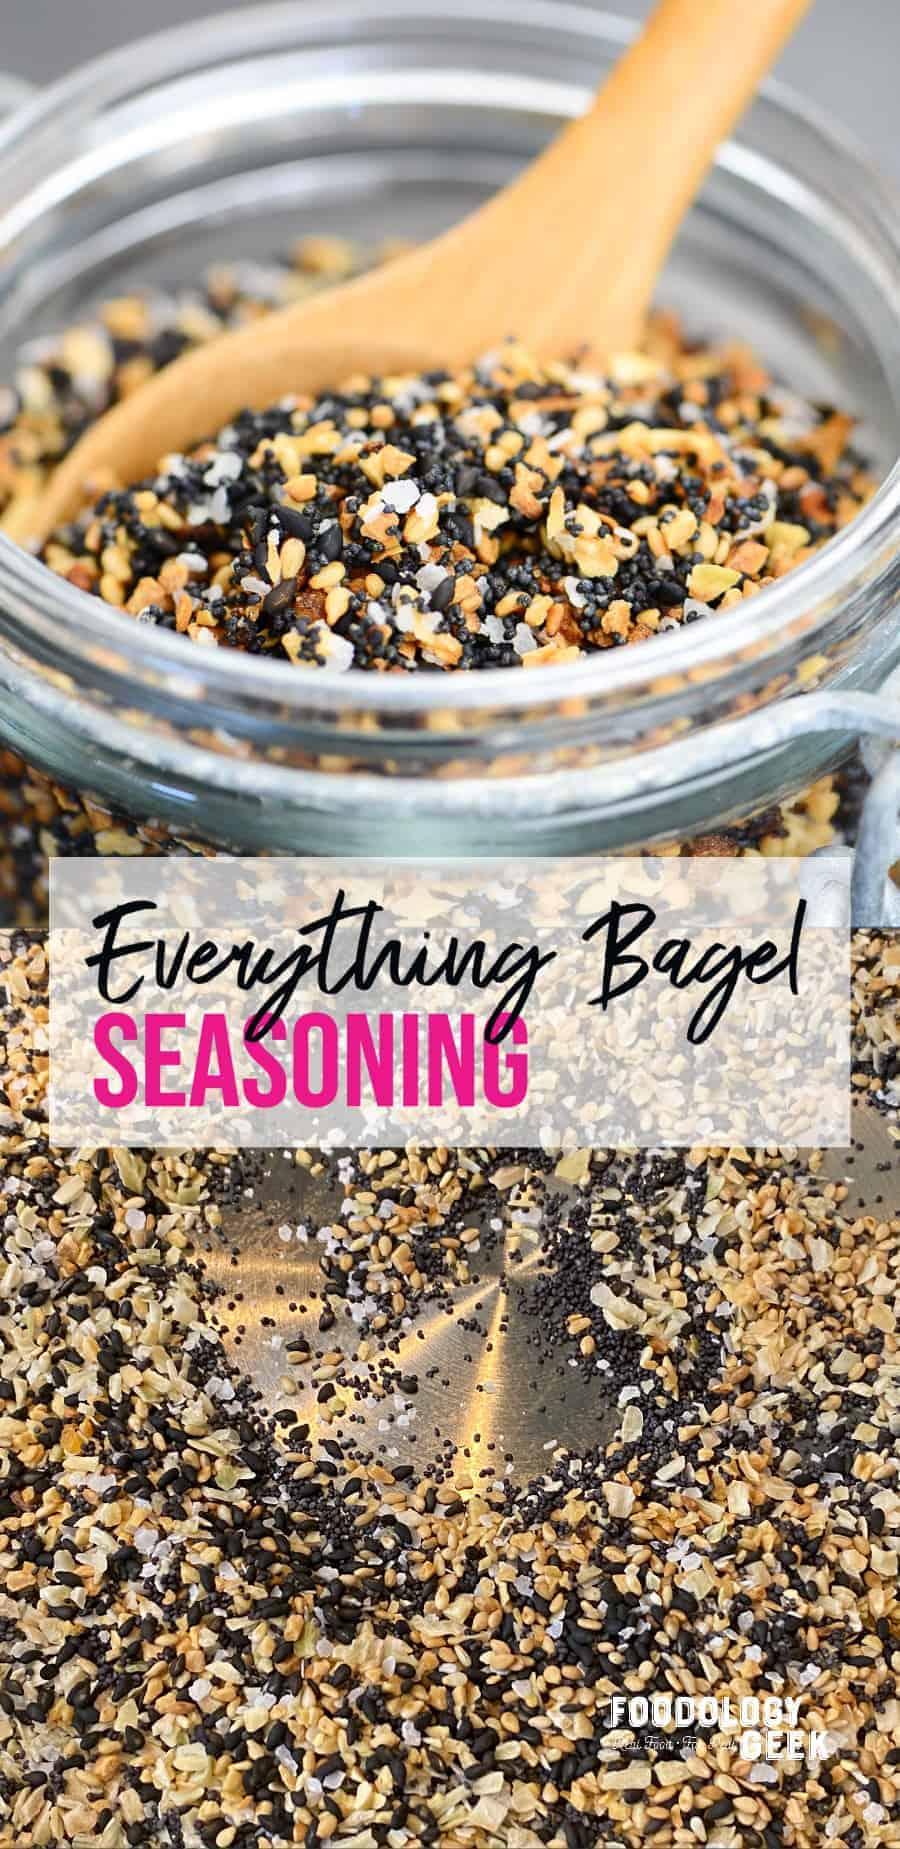 how to make everything bagel seasoning at home   foodology geek